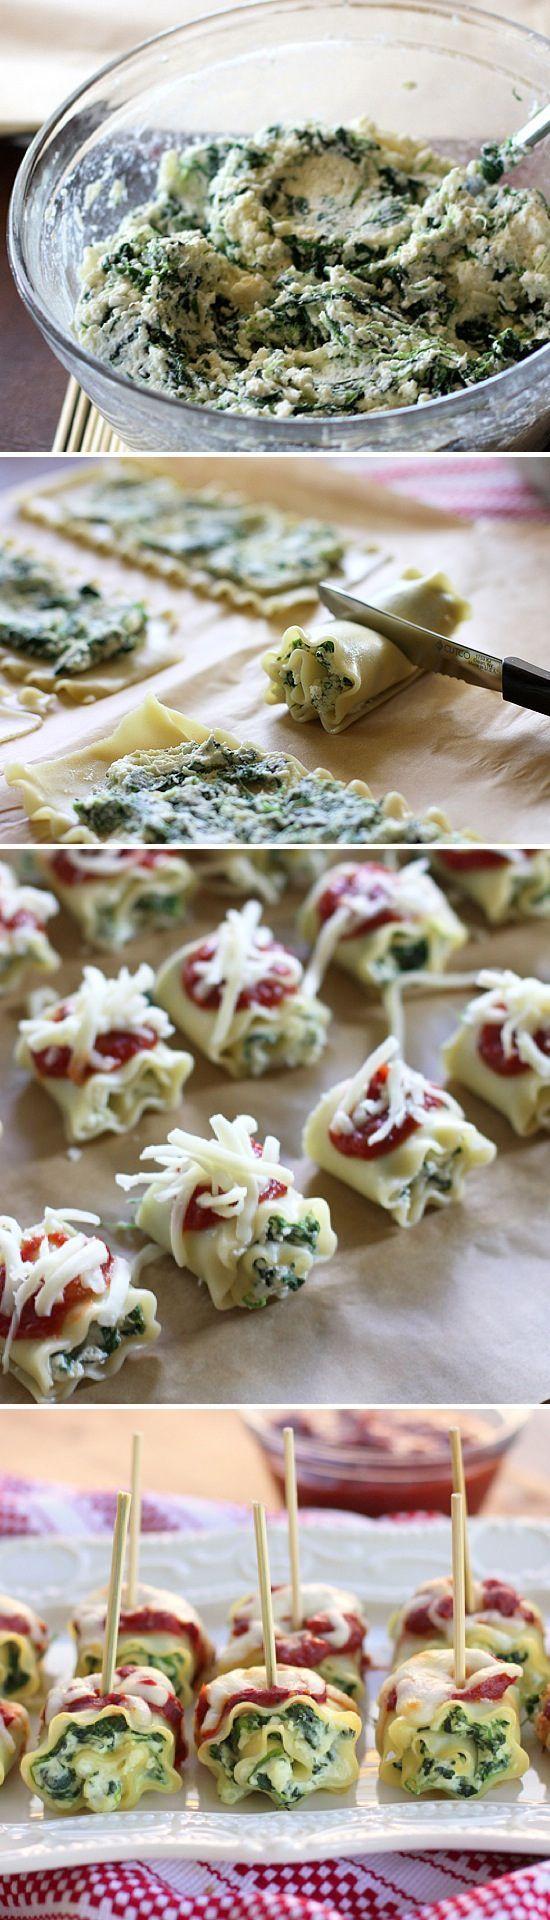 Simple Recipes Mini Spinach Lasagna Roll-Ups - appetizer, lasagna, recipes, simple recipes, vegetable